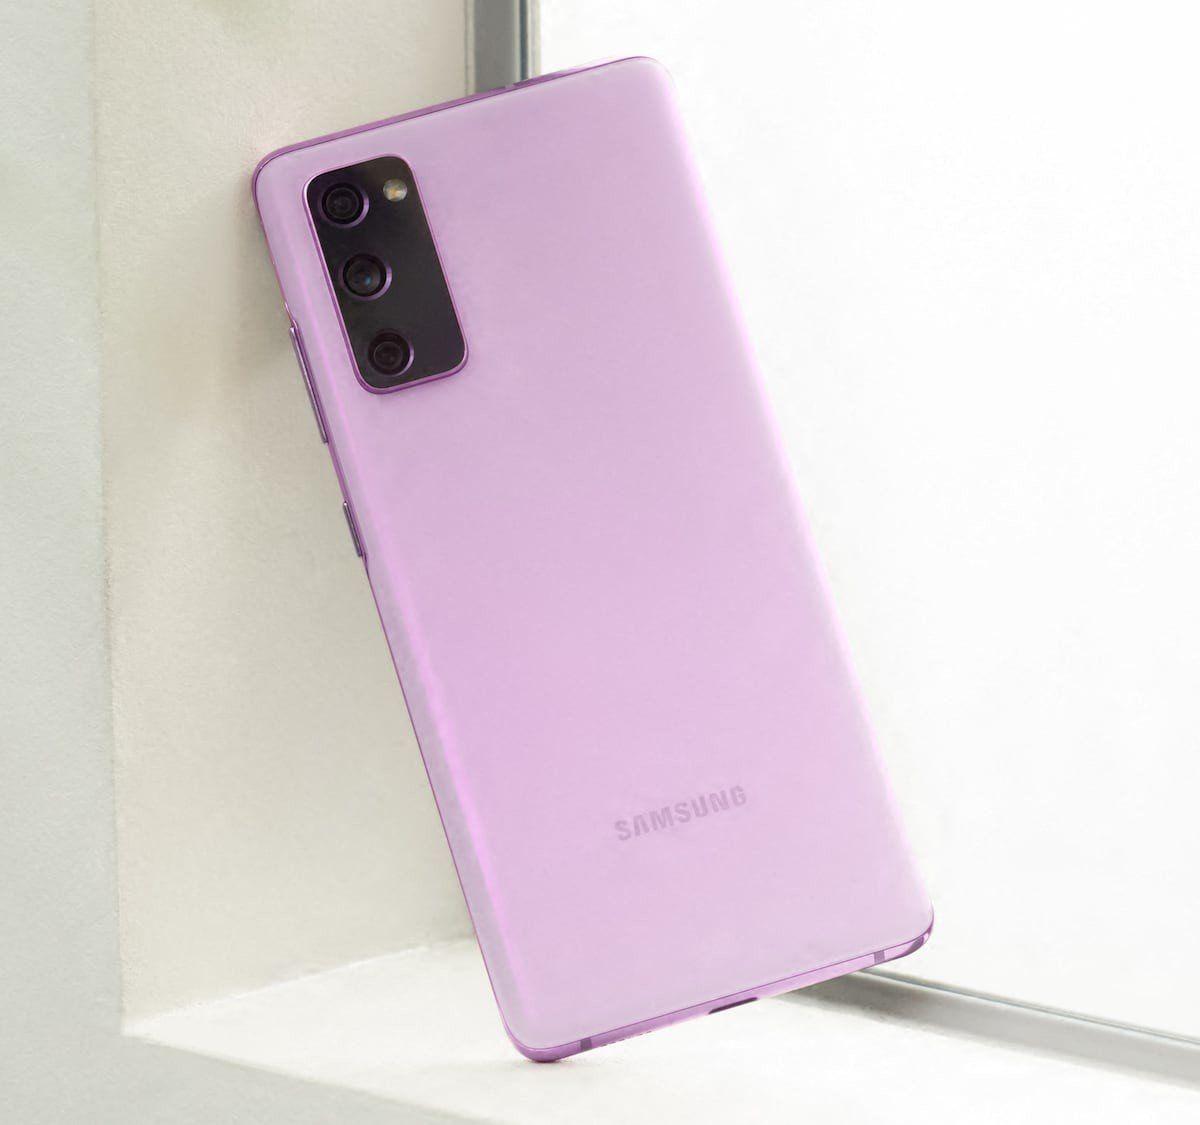 Samsung Galaxy S20 Fe Fan Edition Smartphone Has A Glimmering Haze Finish Samsung Galaxy Samsung Galaxy